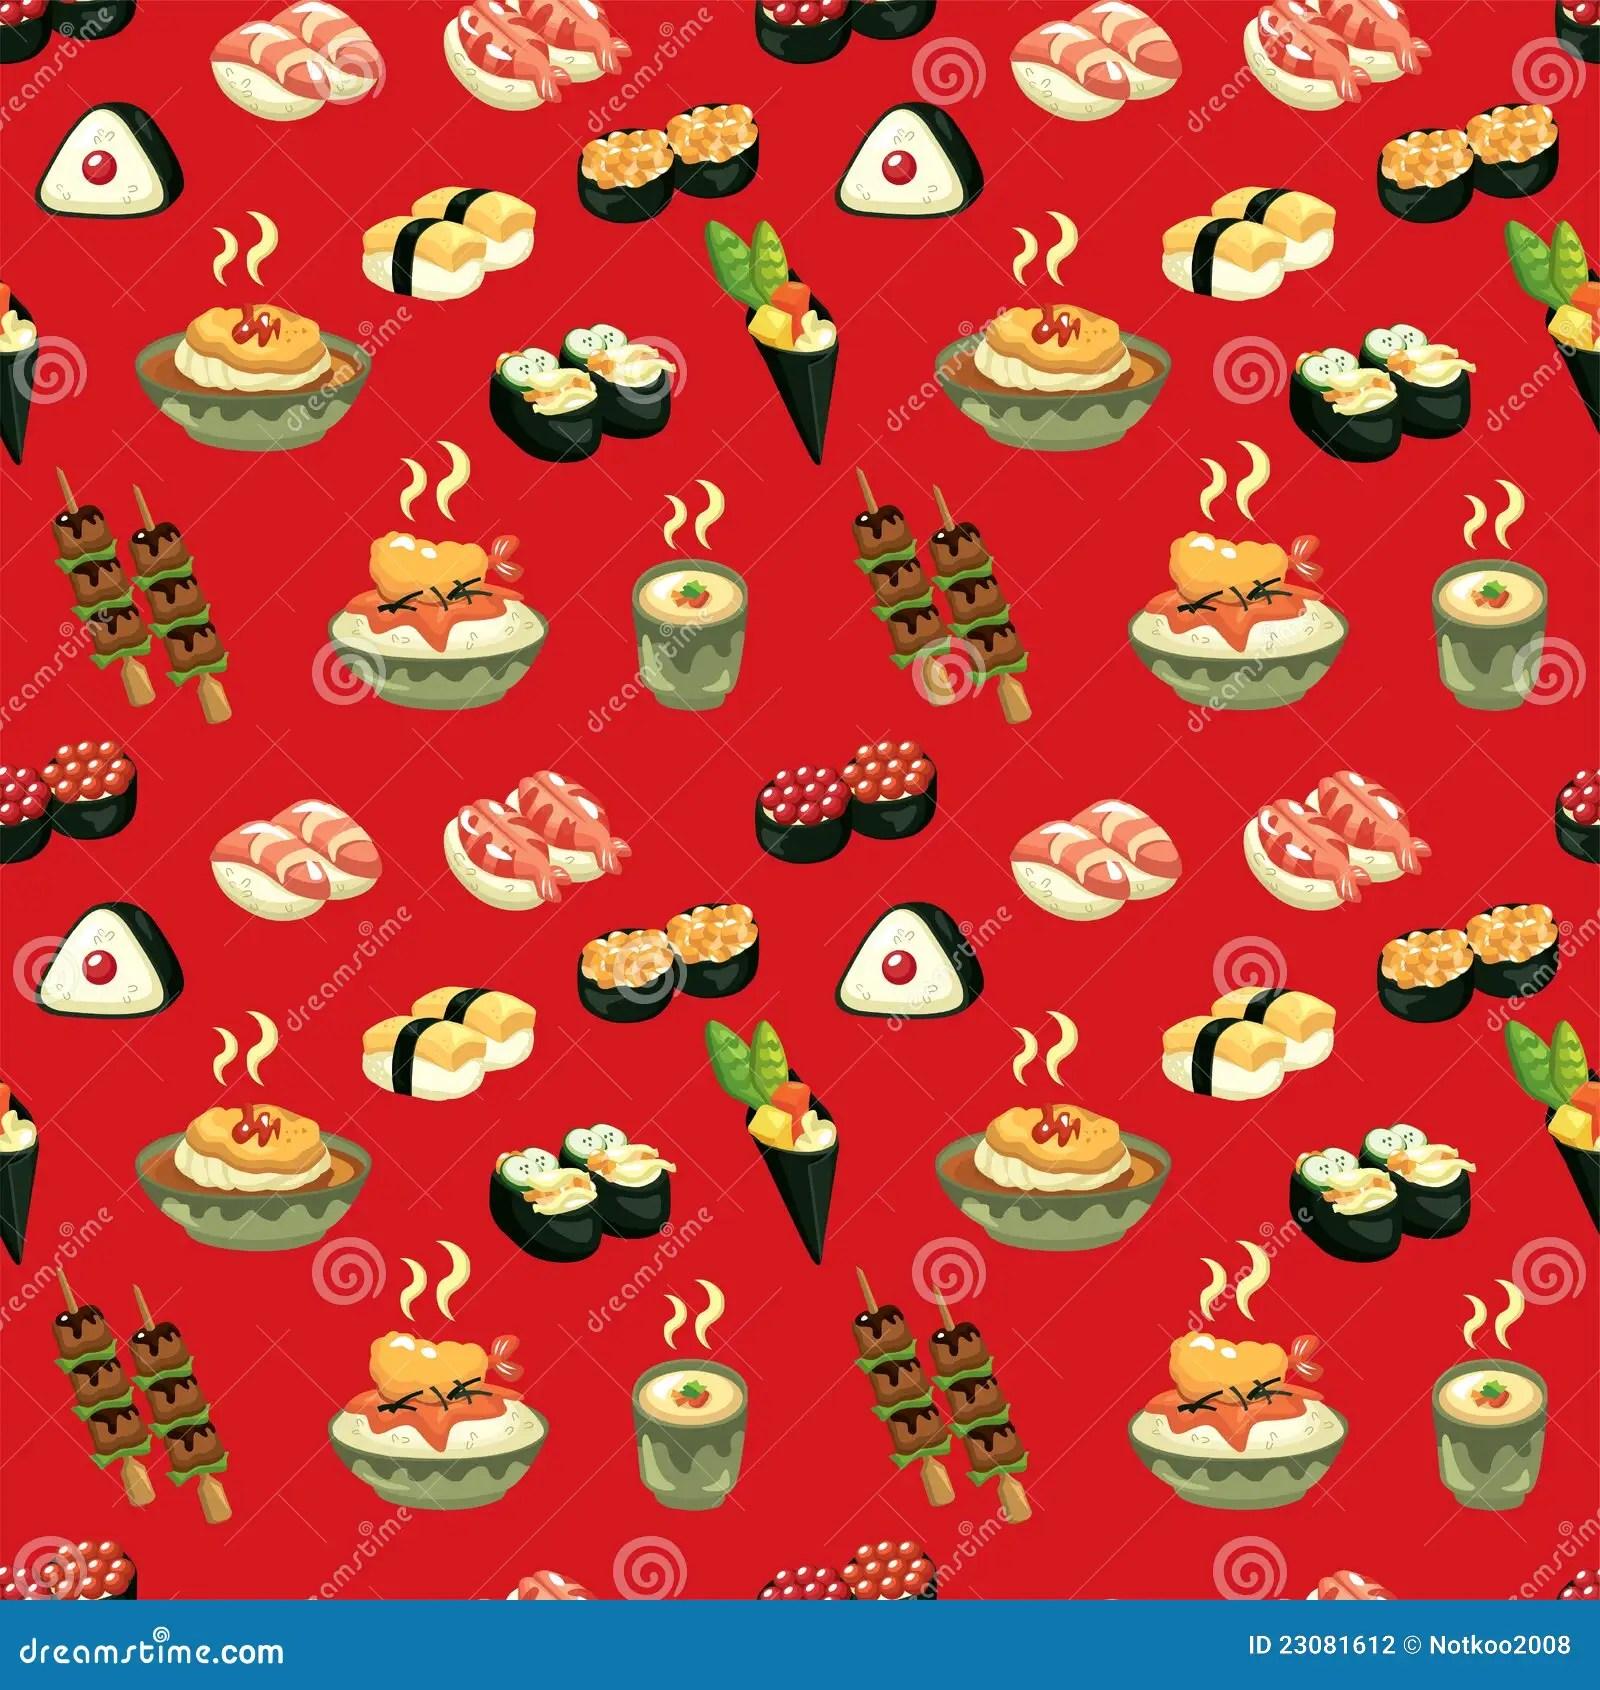 Cute Chinese Cartoon Wallpaper Seamless Japanese Food Pattern Stock Photography Image